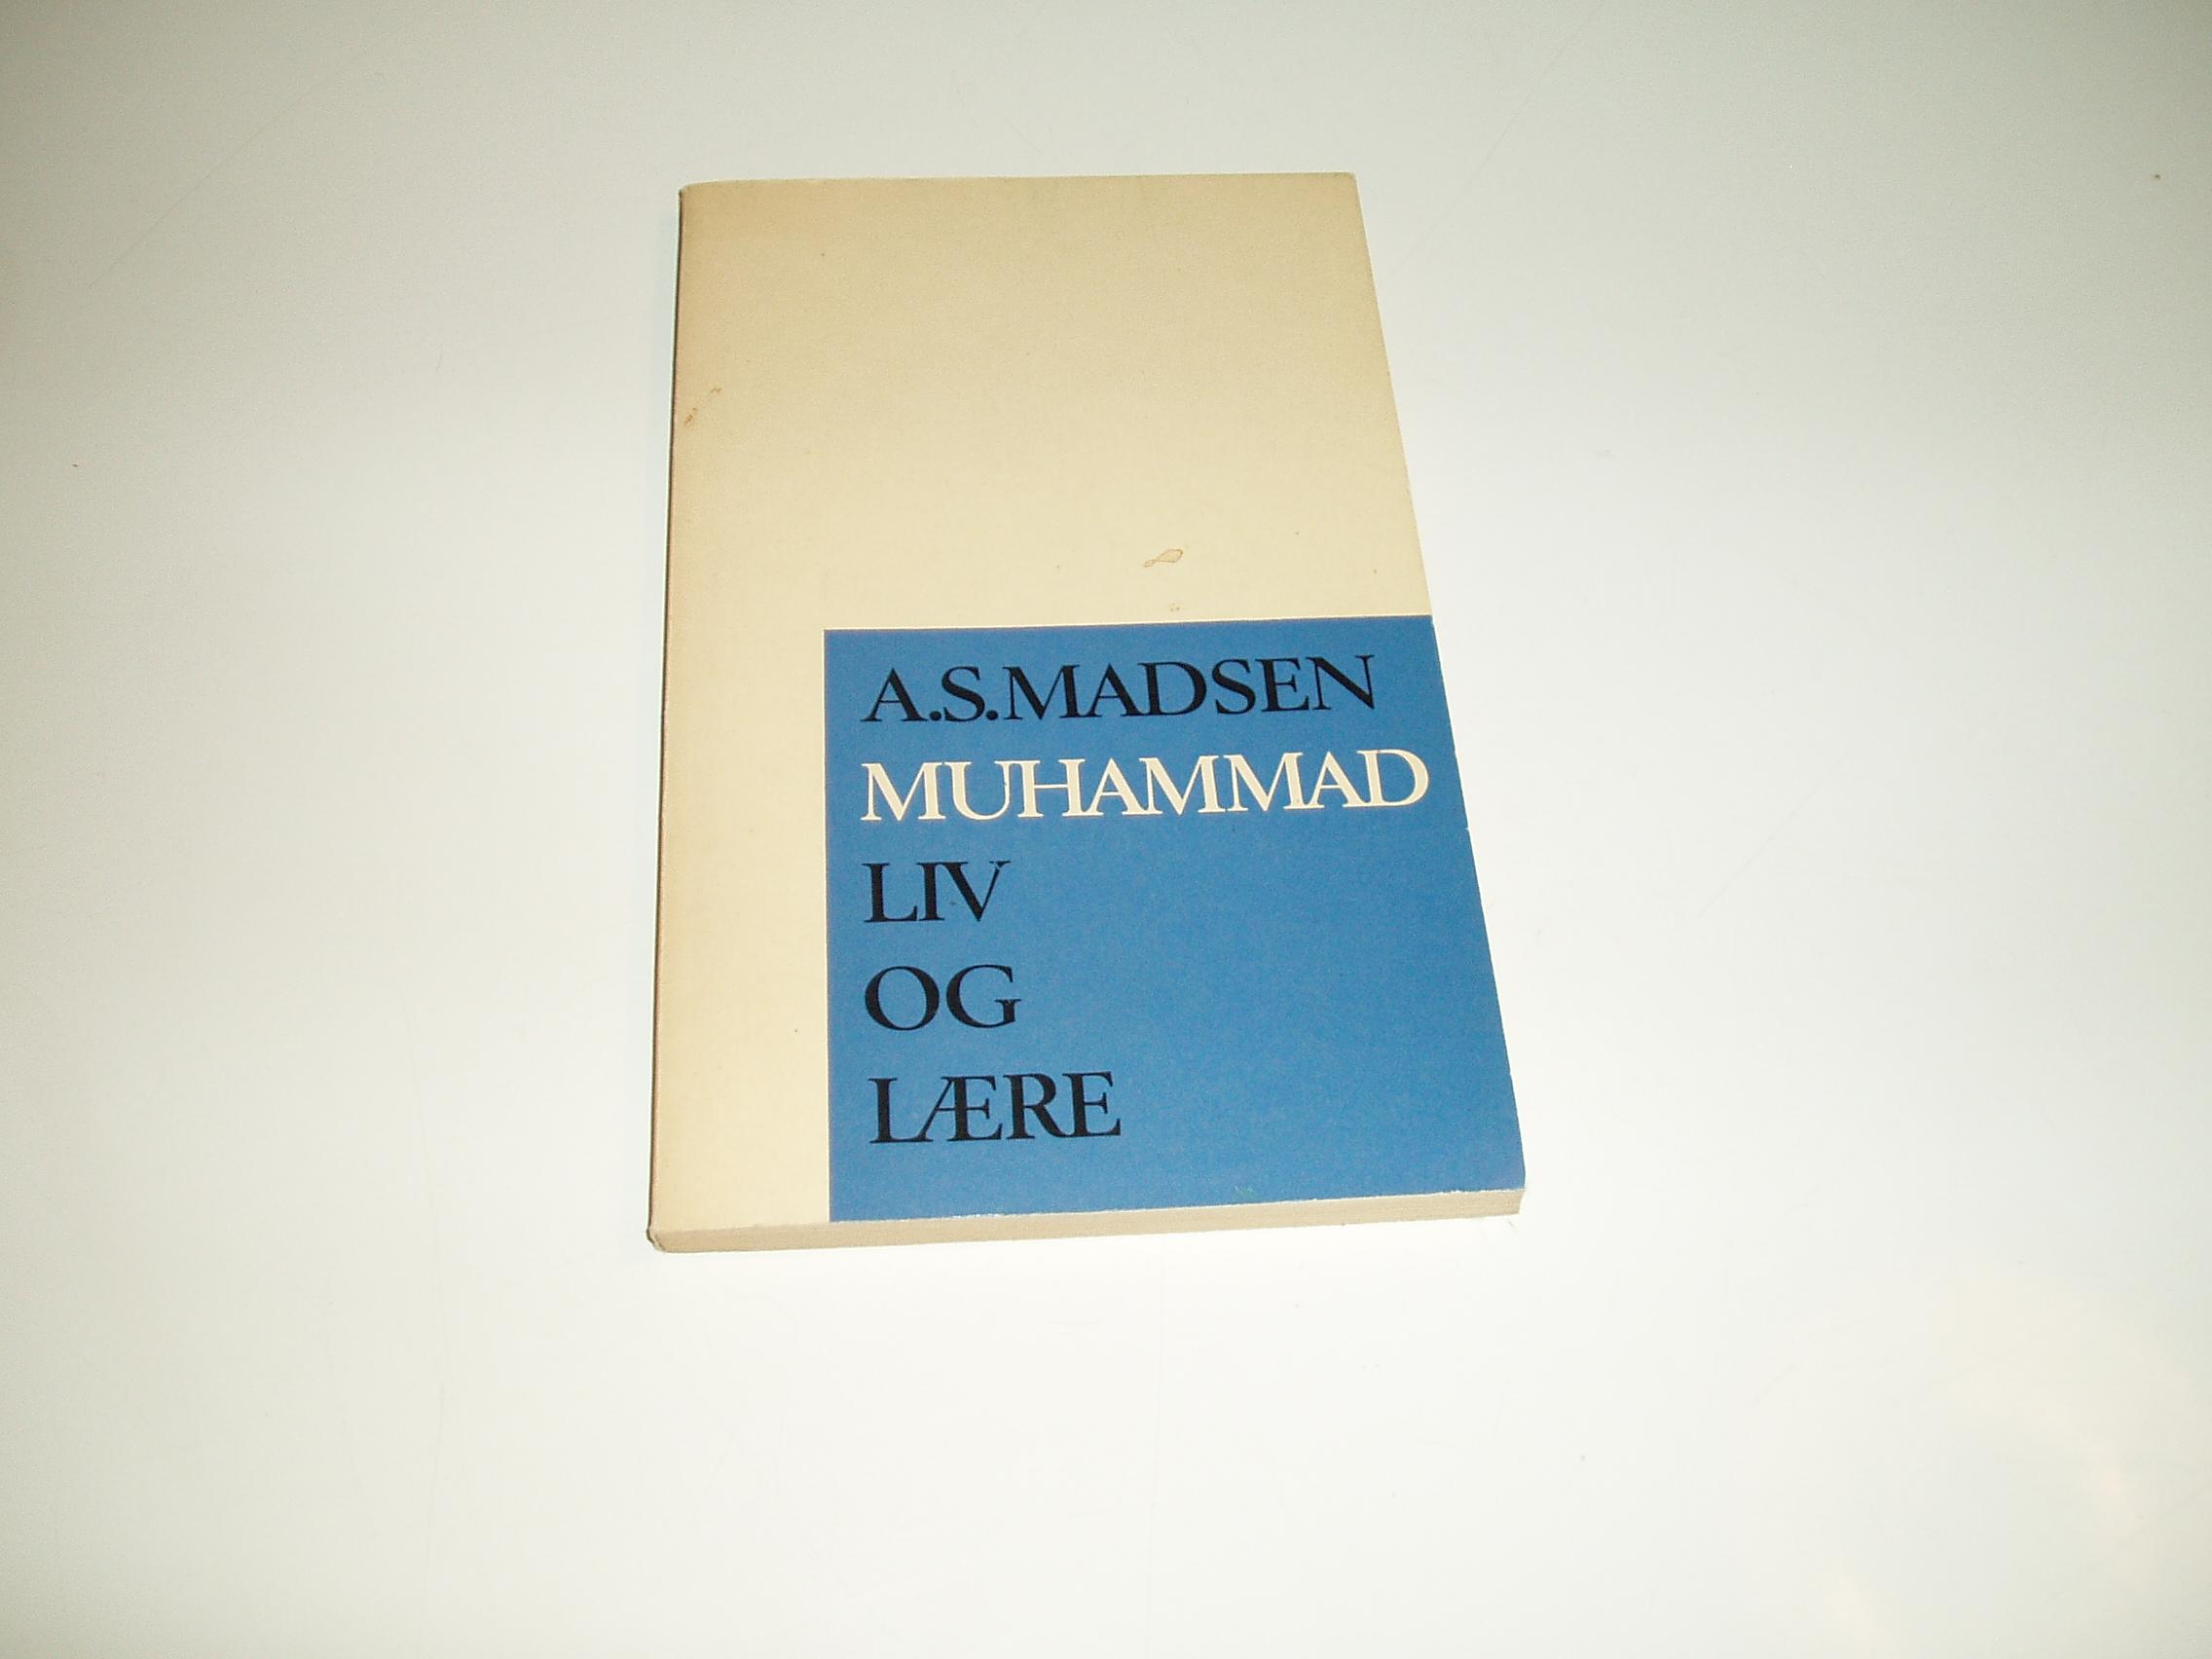 Muhammad. Liv og lære